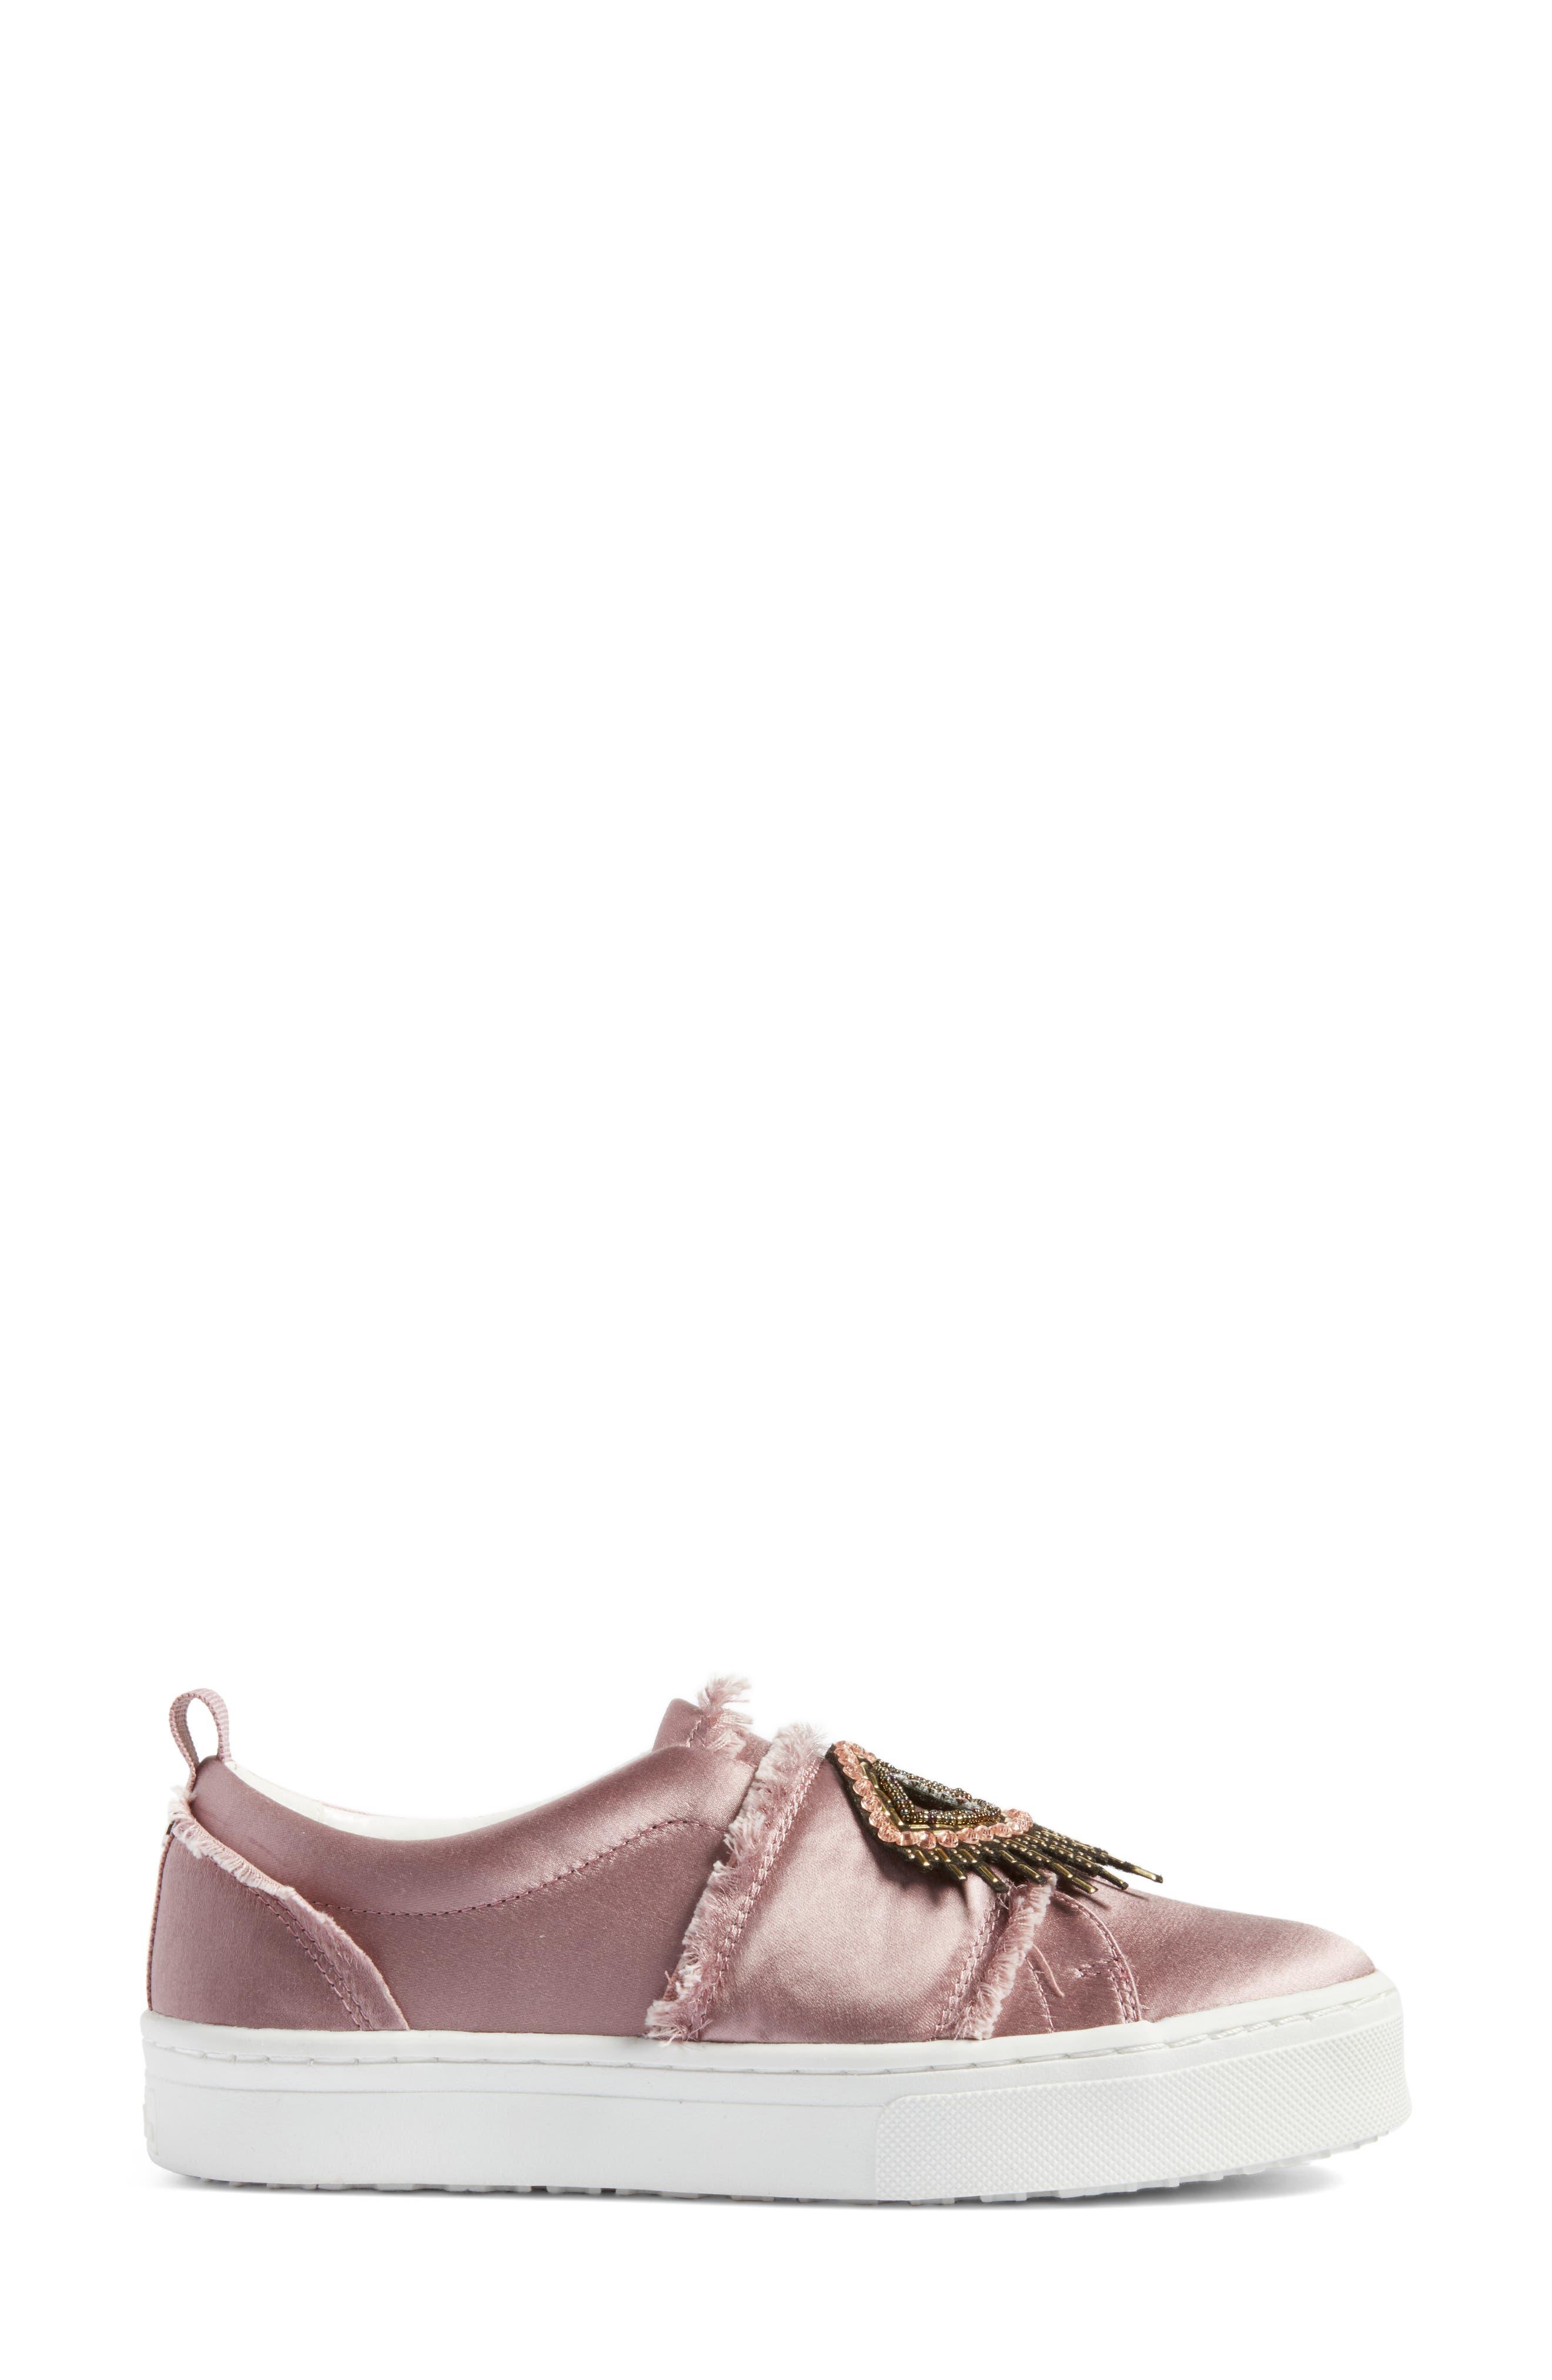 Levine Sneaker,                             Alternate thumbnail 3, color,                             Pearl Pink Satin